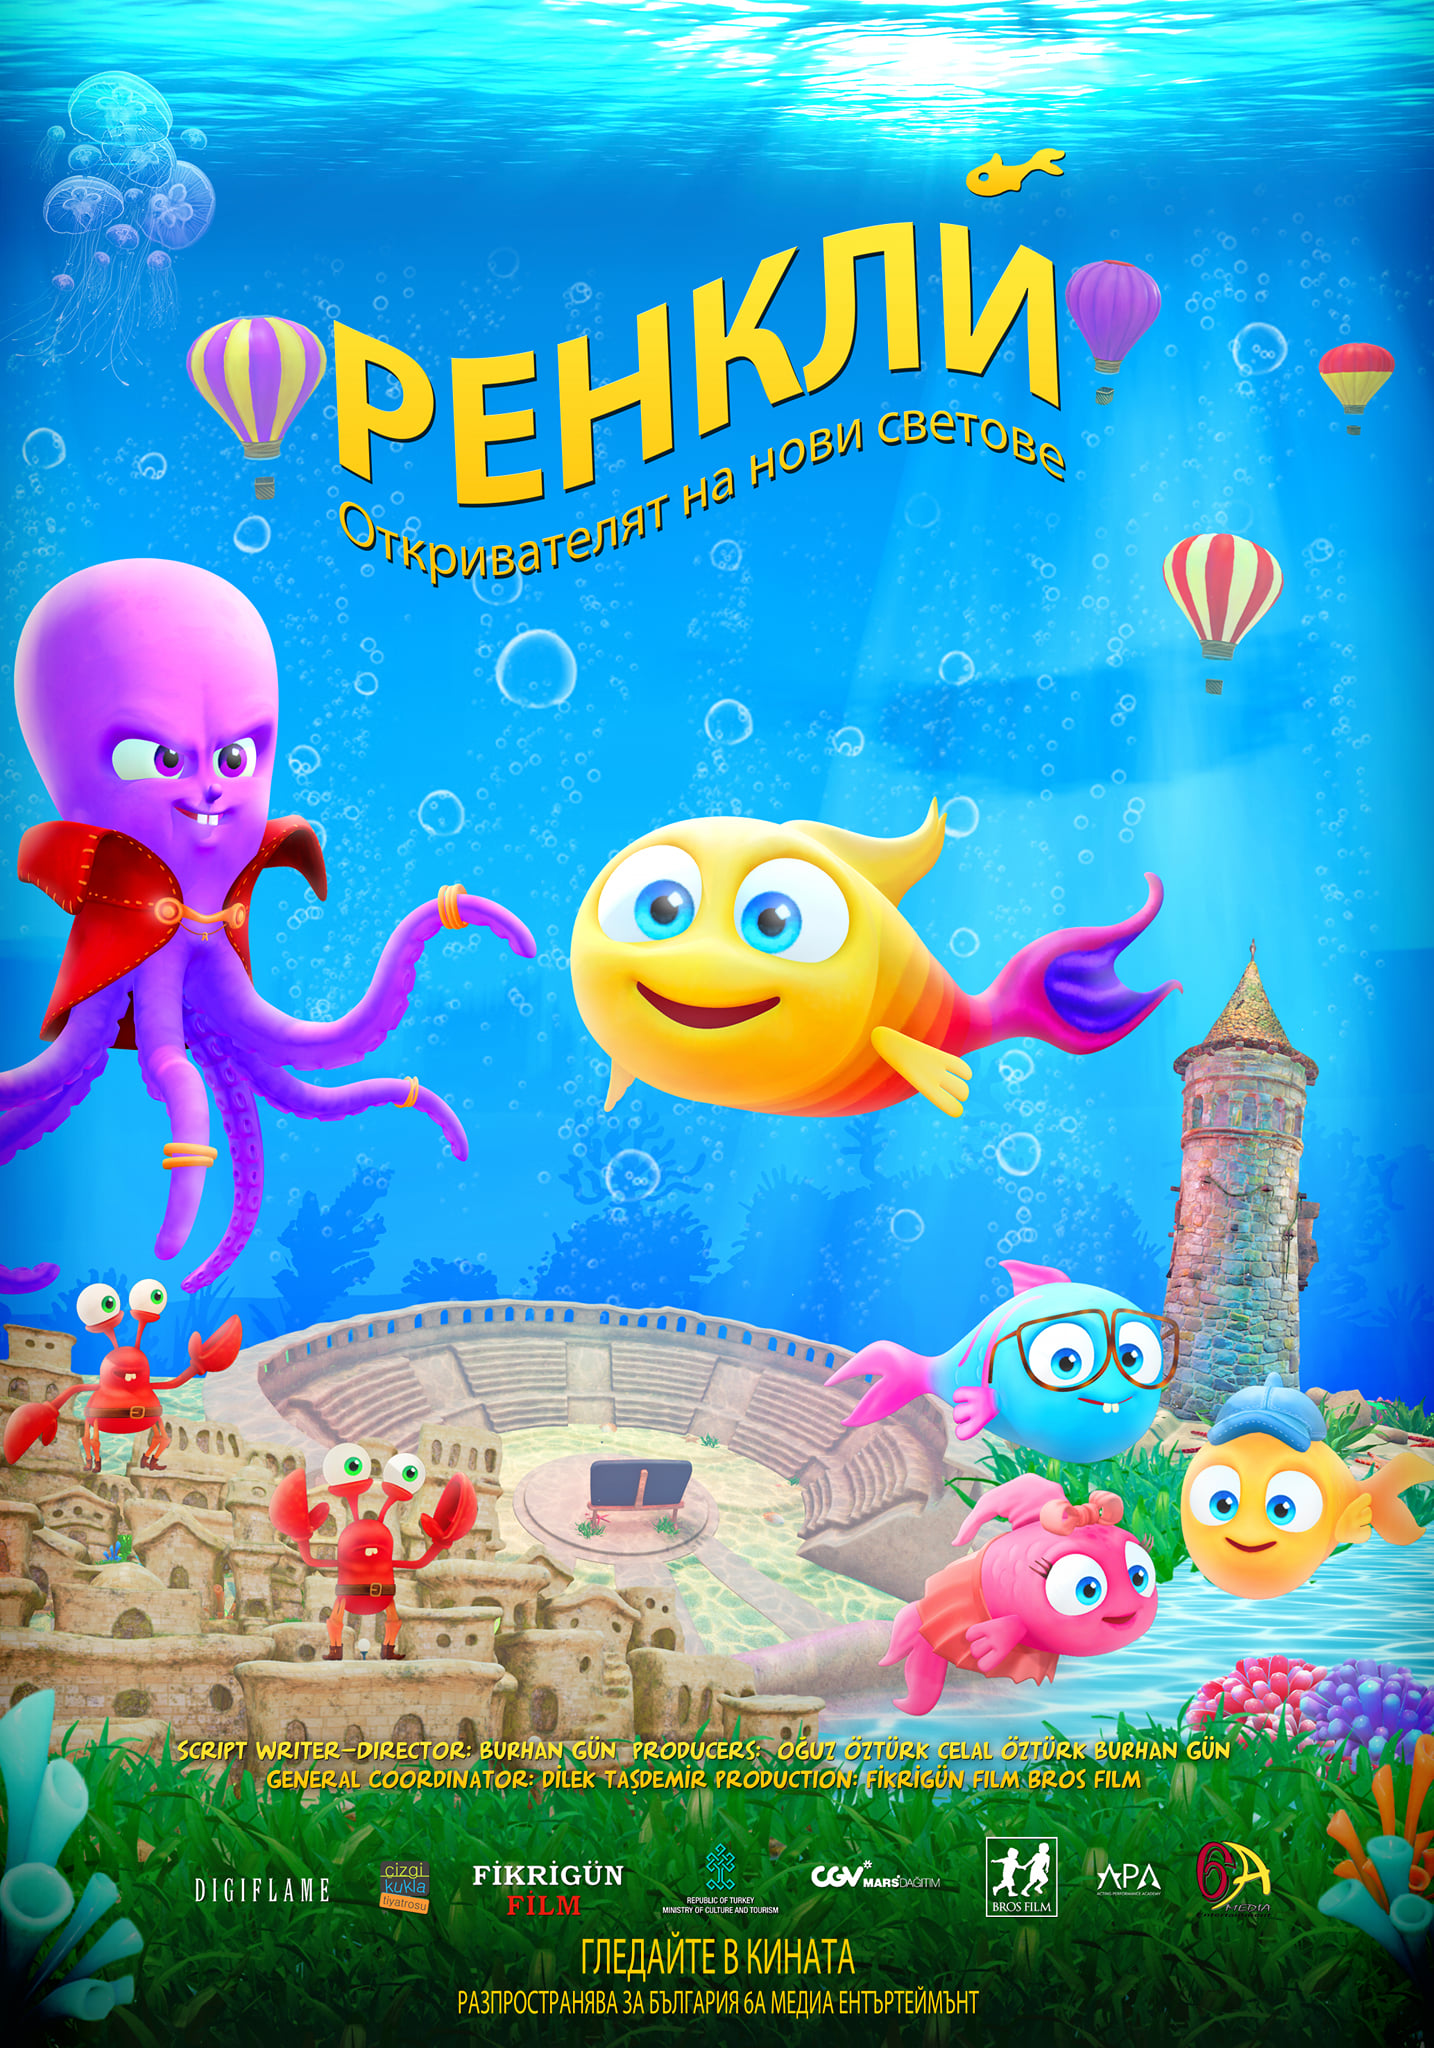 ВЛАЙКОВА: Кино програма - 17-23 септември 2021